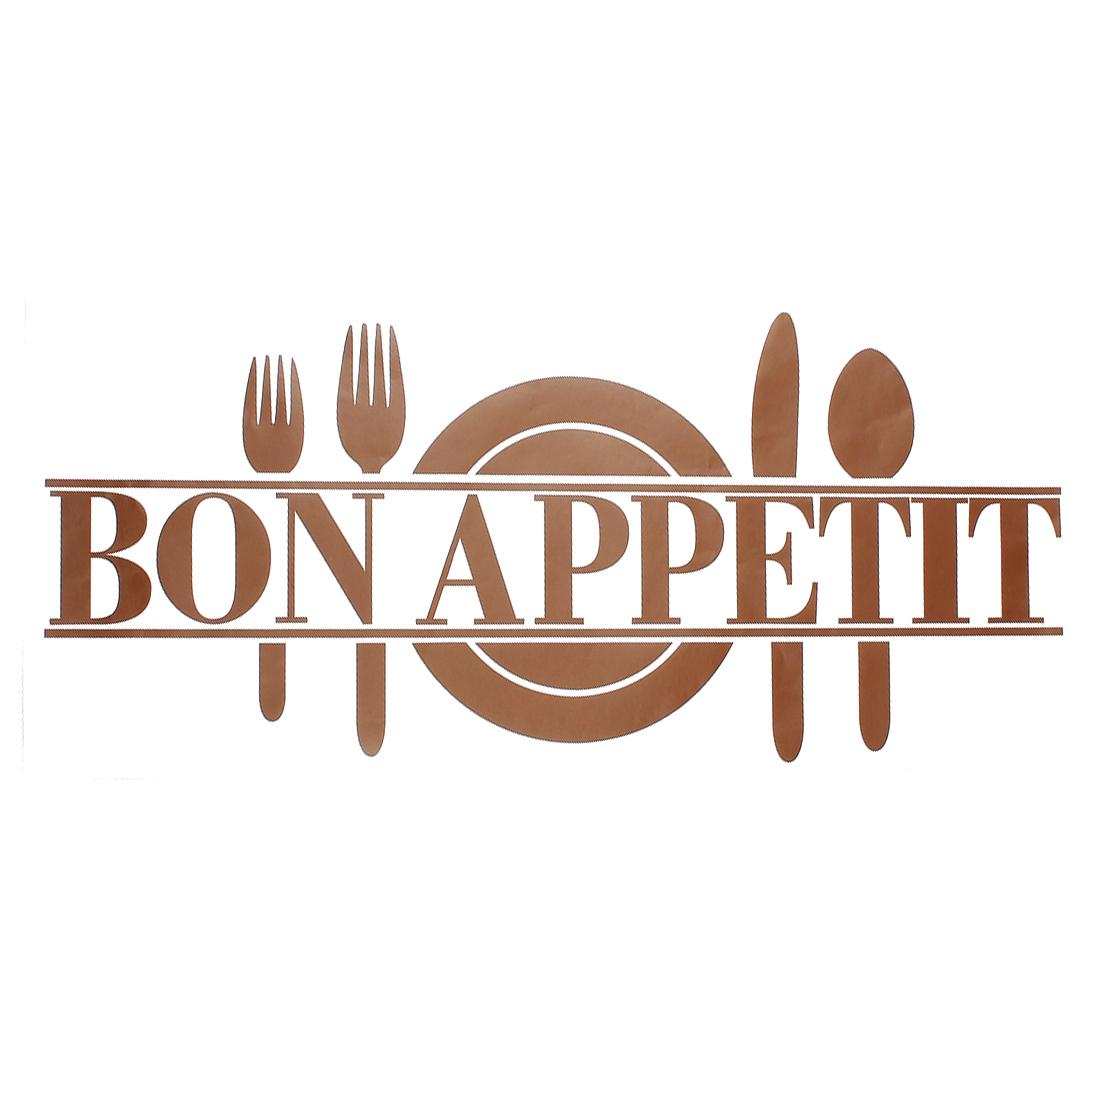 Bon Appetit Cutlery Pattern Restaurant Decor Wall Sticker Decal 60x25cm Brown